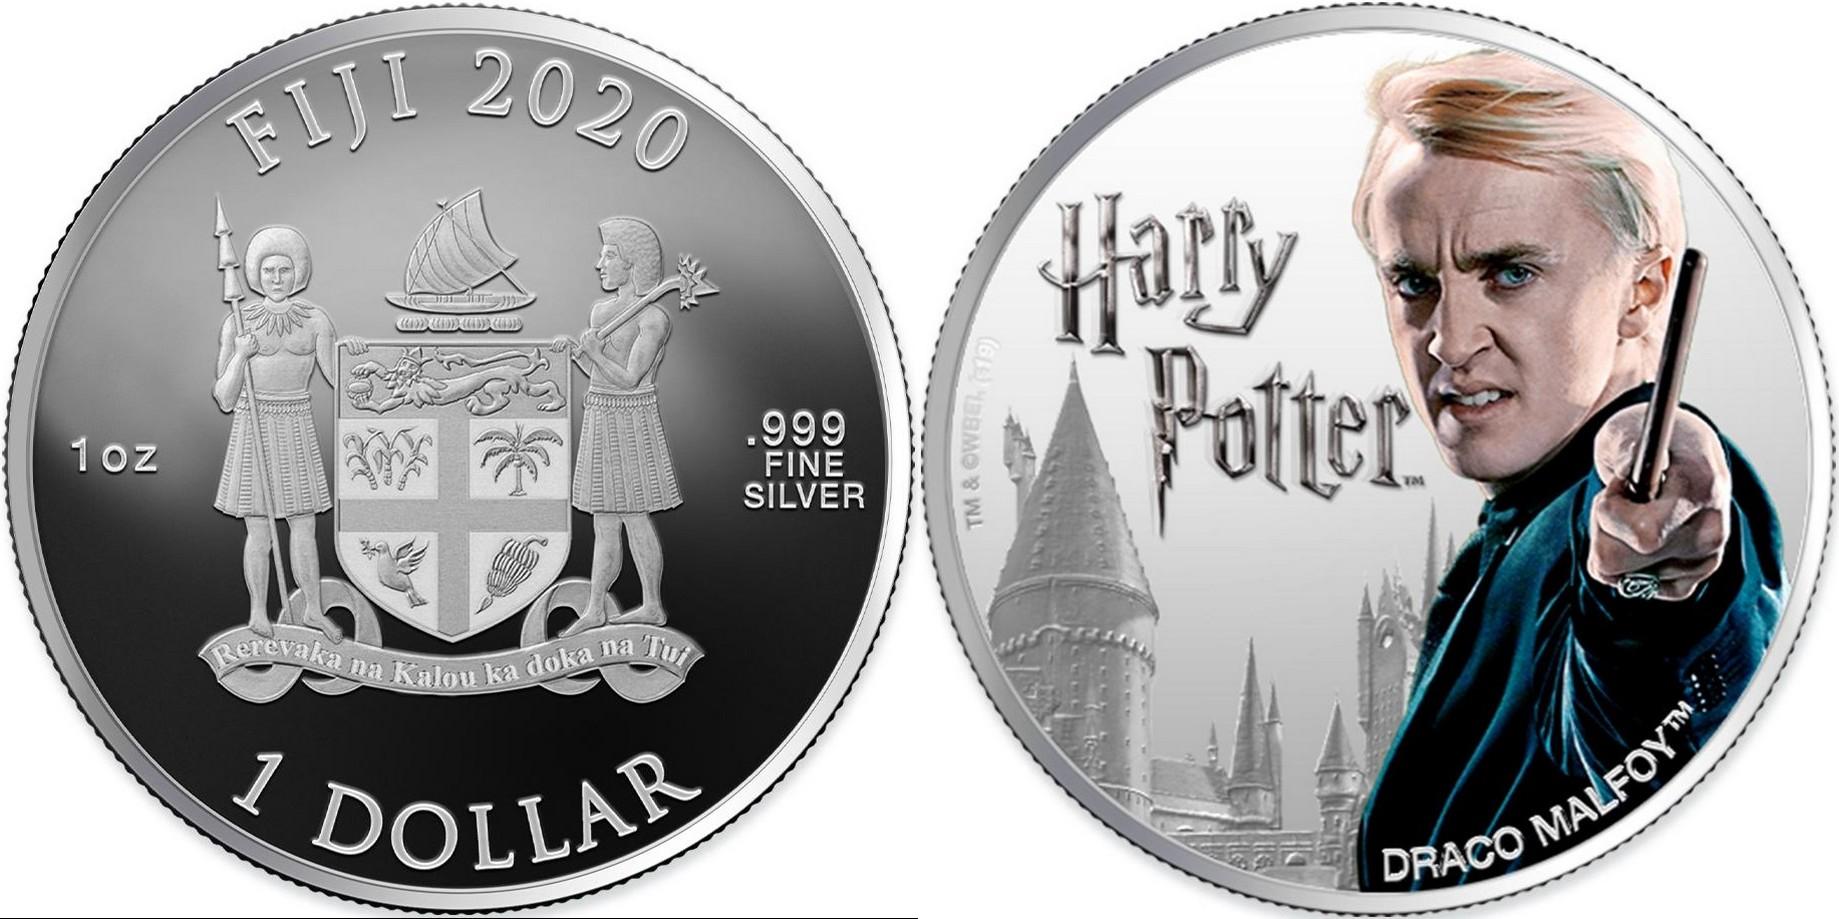 fidji-2020-harry-potter-draco-malfoy